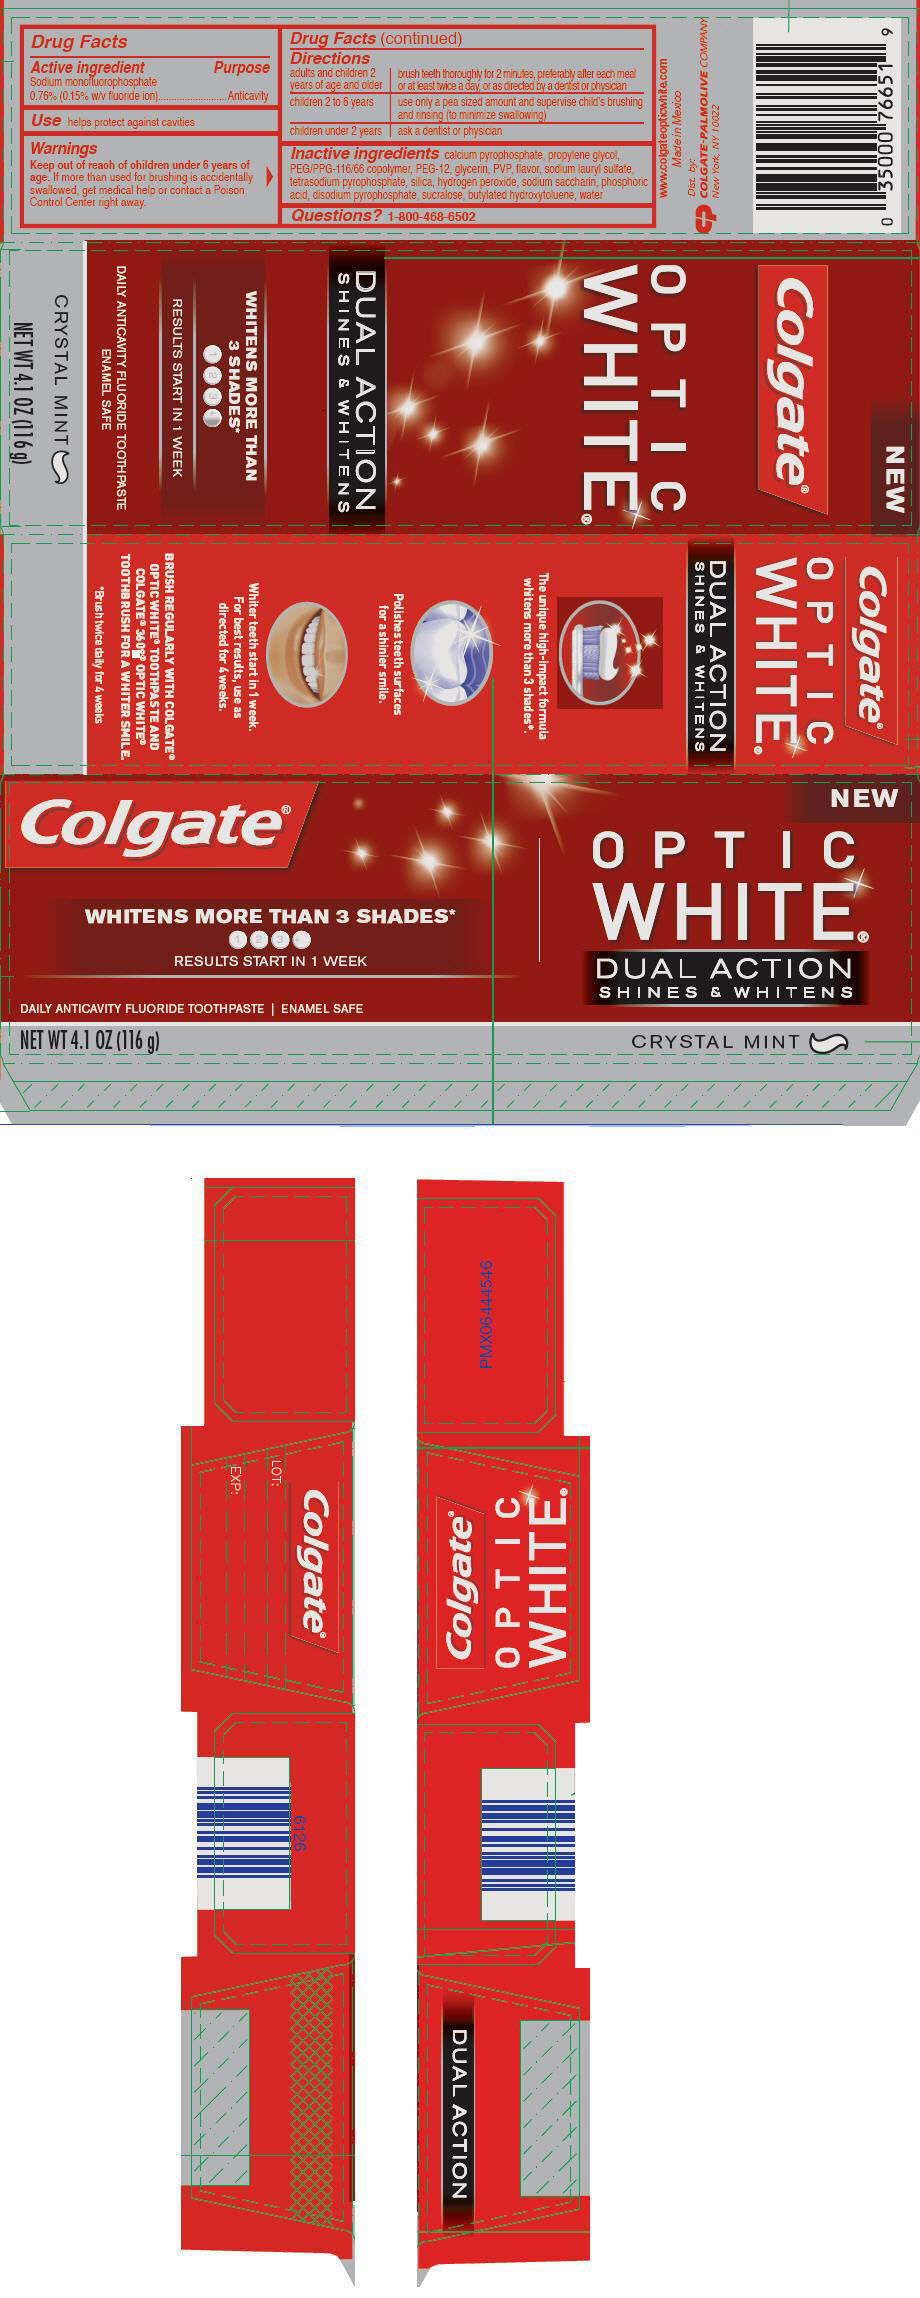 Colgate Optic White Dual Action Crystal Mint (Sodium Monofluorophosphate) Paste, Dentifrice [Mission Hills S.a De C.v]